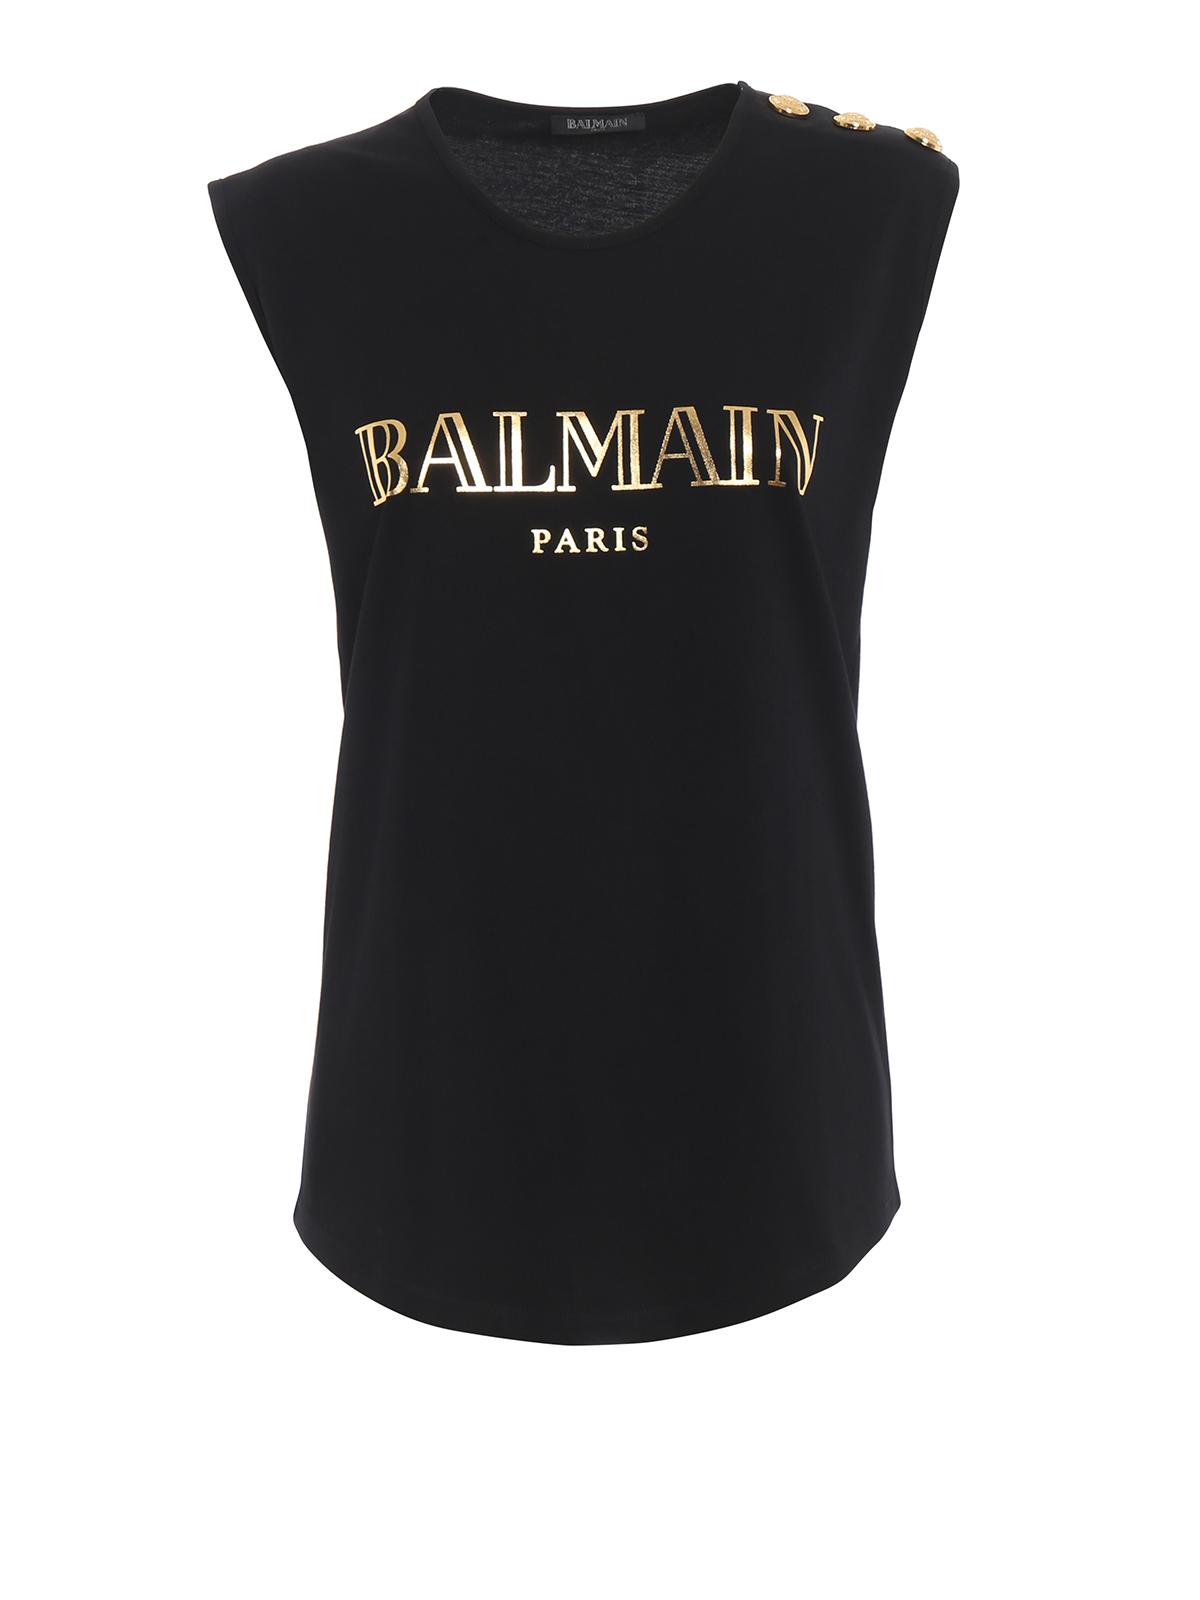 1c0c6193 Logo print black cotton tank top RF01162I170EAD - BALMAIN - Paolo ...